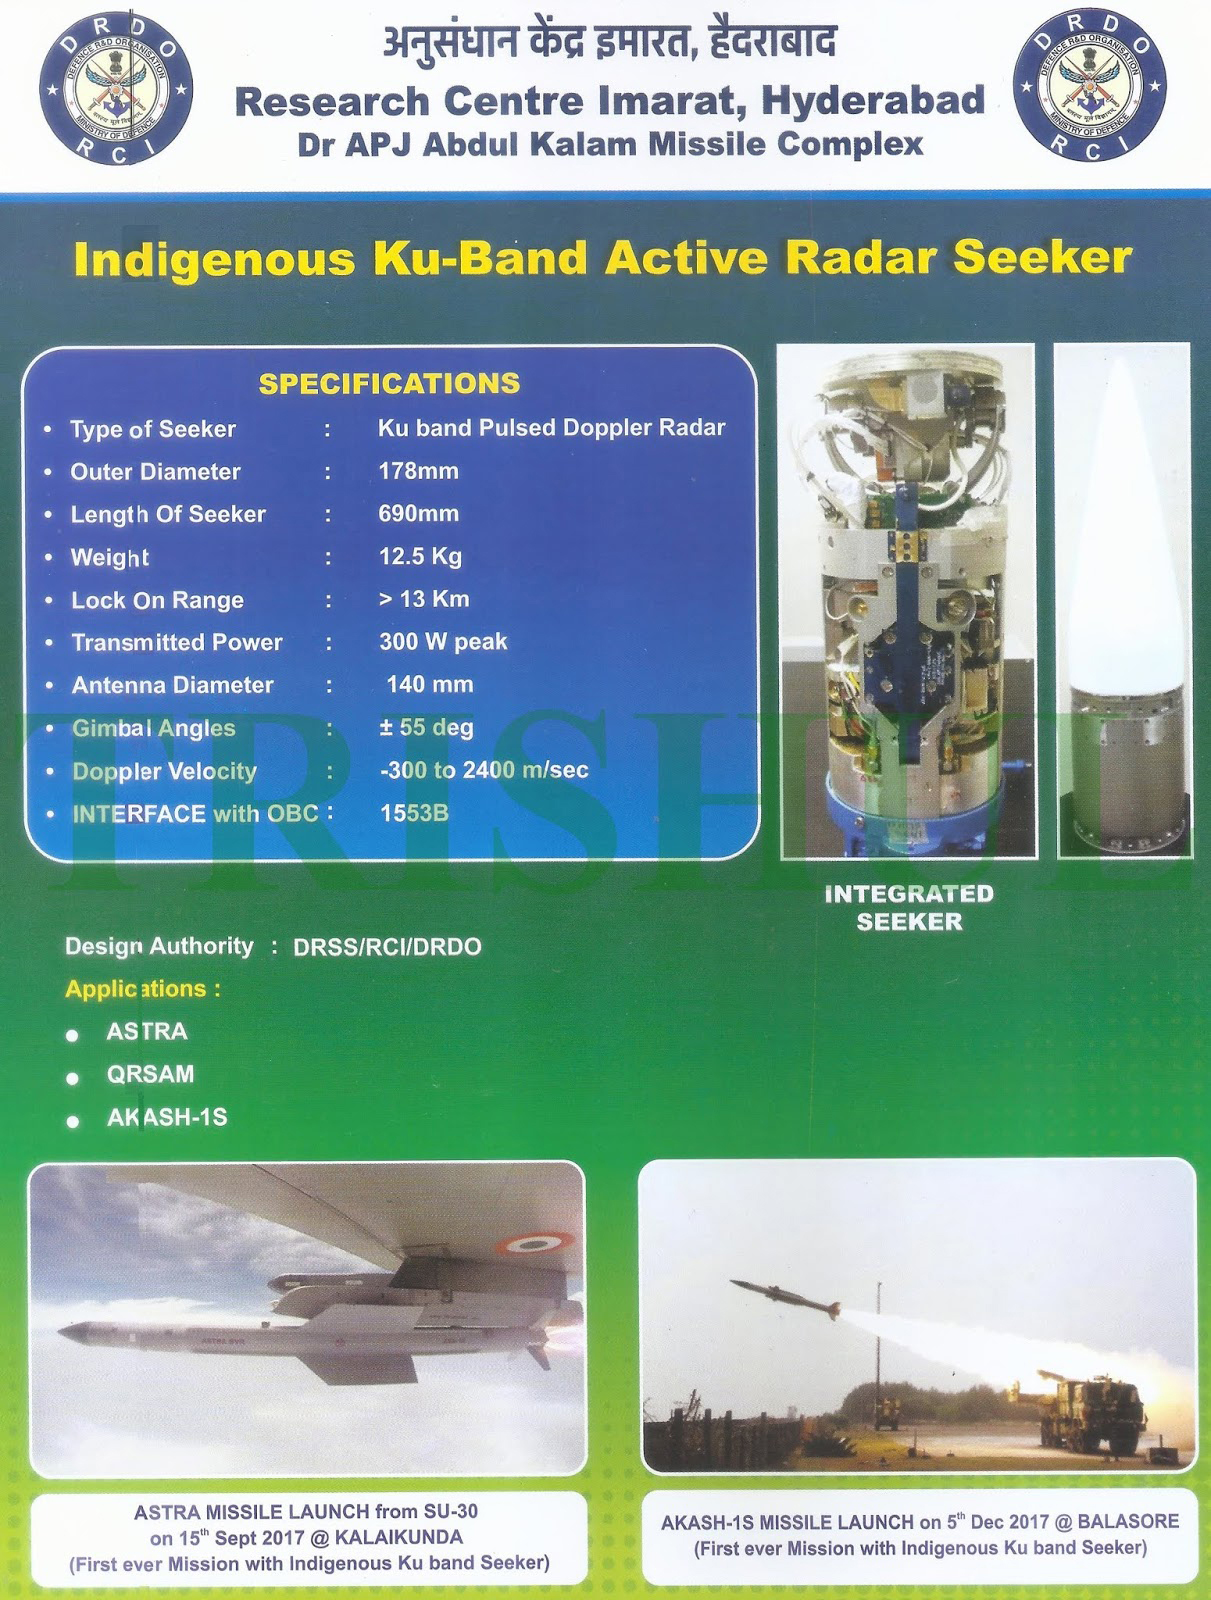 Astra-1 BVRAAM's Ku-band Seeker (2).jpg